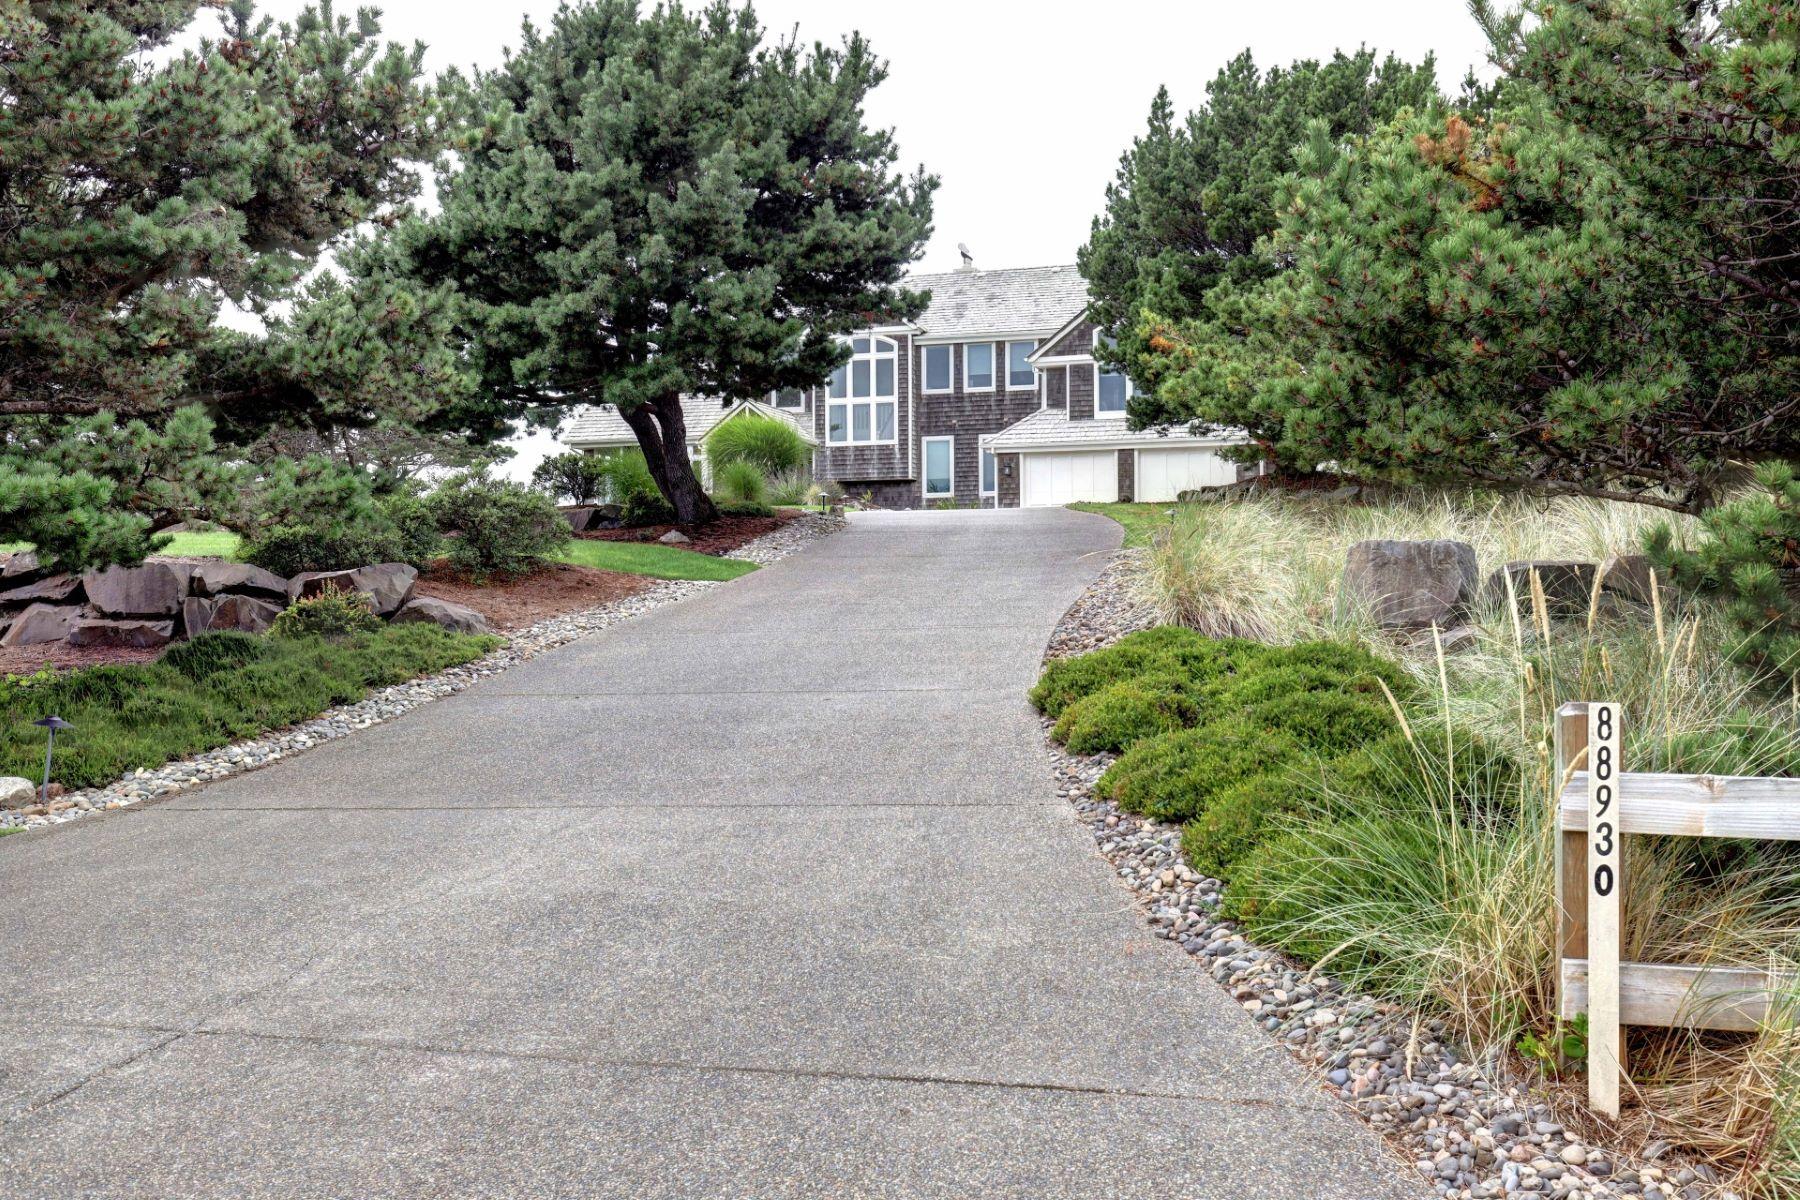 Other Residential Homes για την Πώληση στο 88930 Pinehurst Rd Gearhart, OR 97138 Gearhart, Ορεγκον 97138 Ηνωμένες Πολιτείες